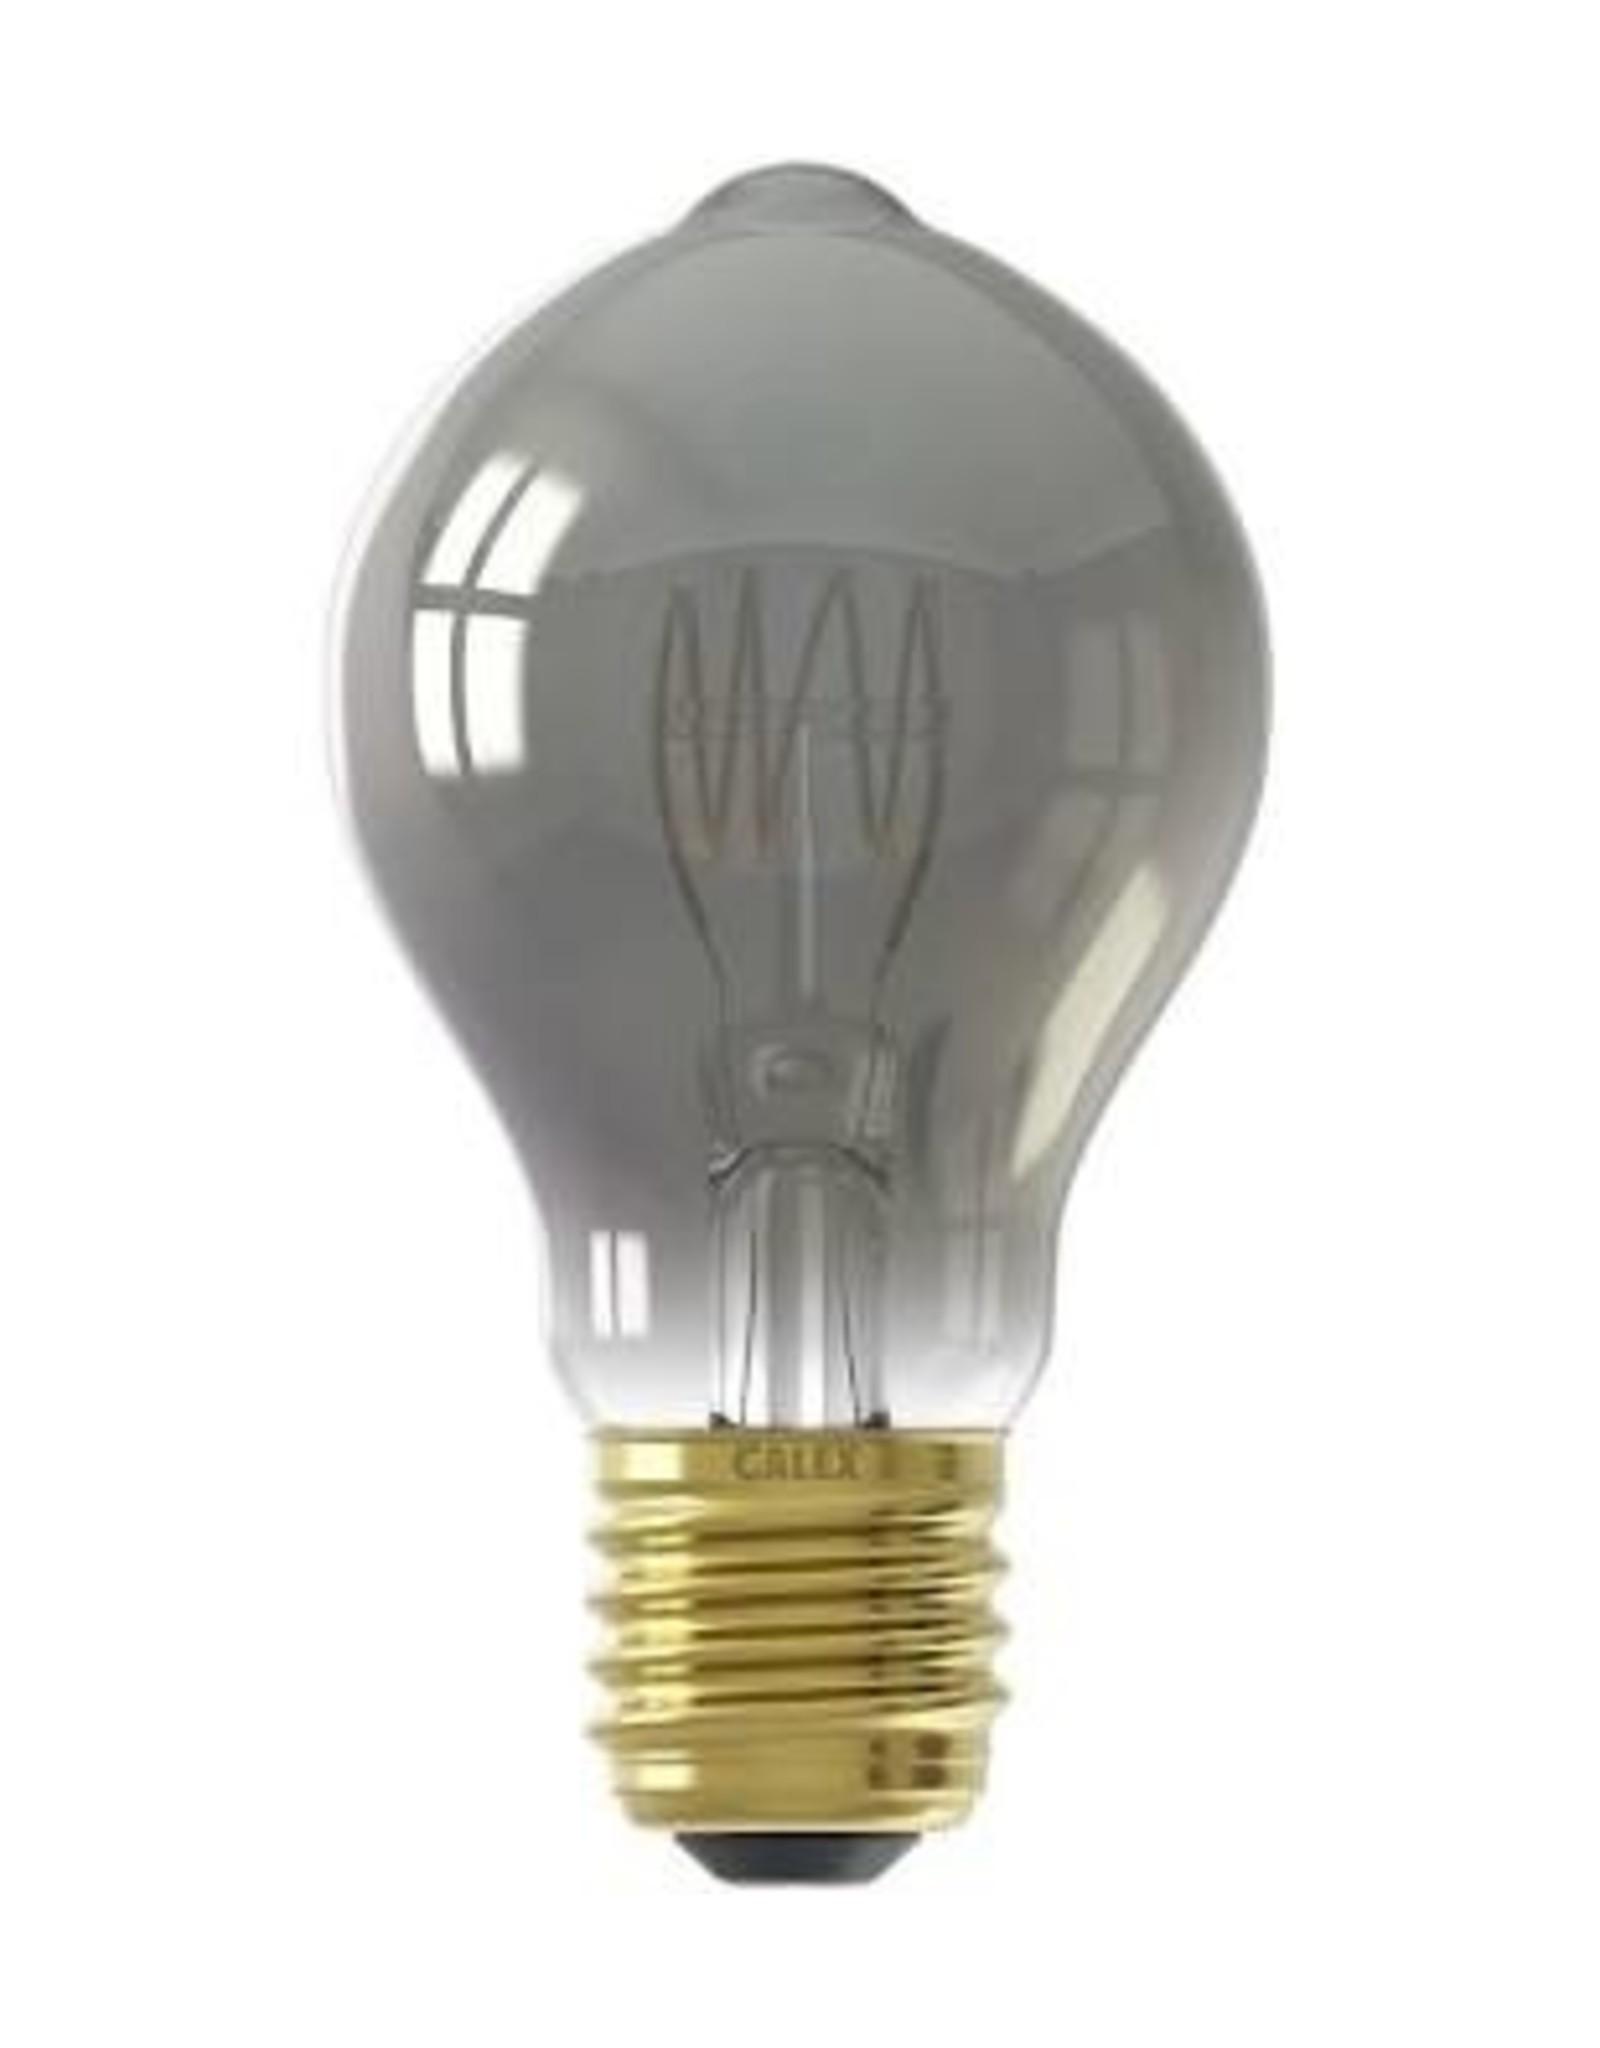 Calex LED Full Glass Flex Filament GLS-lamp 220-240V 4W 100lm E27 A60DR, Titanium 2100K Dimmable, energy label B